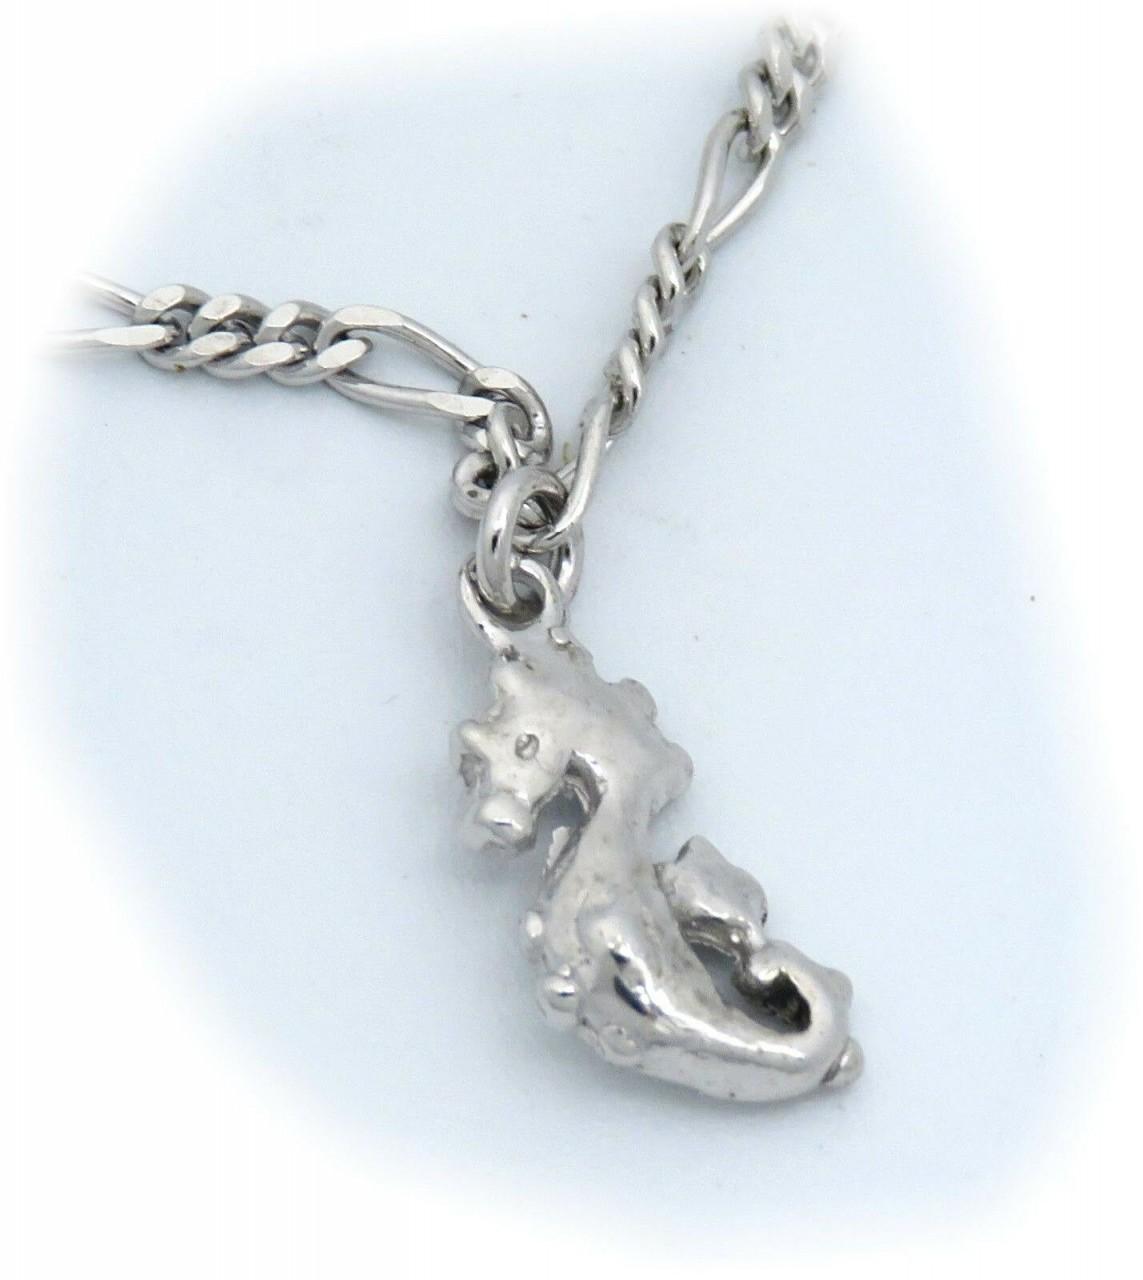 Neu Fußkettchen Seepferdchen Silber 925 Ankerkette 25cm Fußkette Sterlingsilber